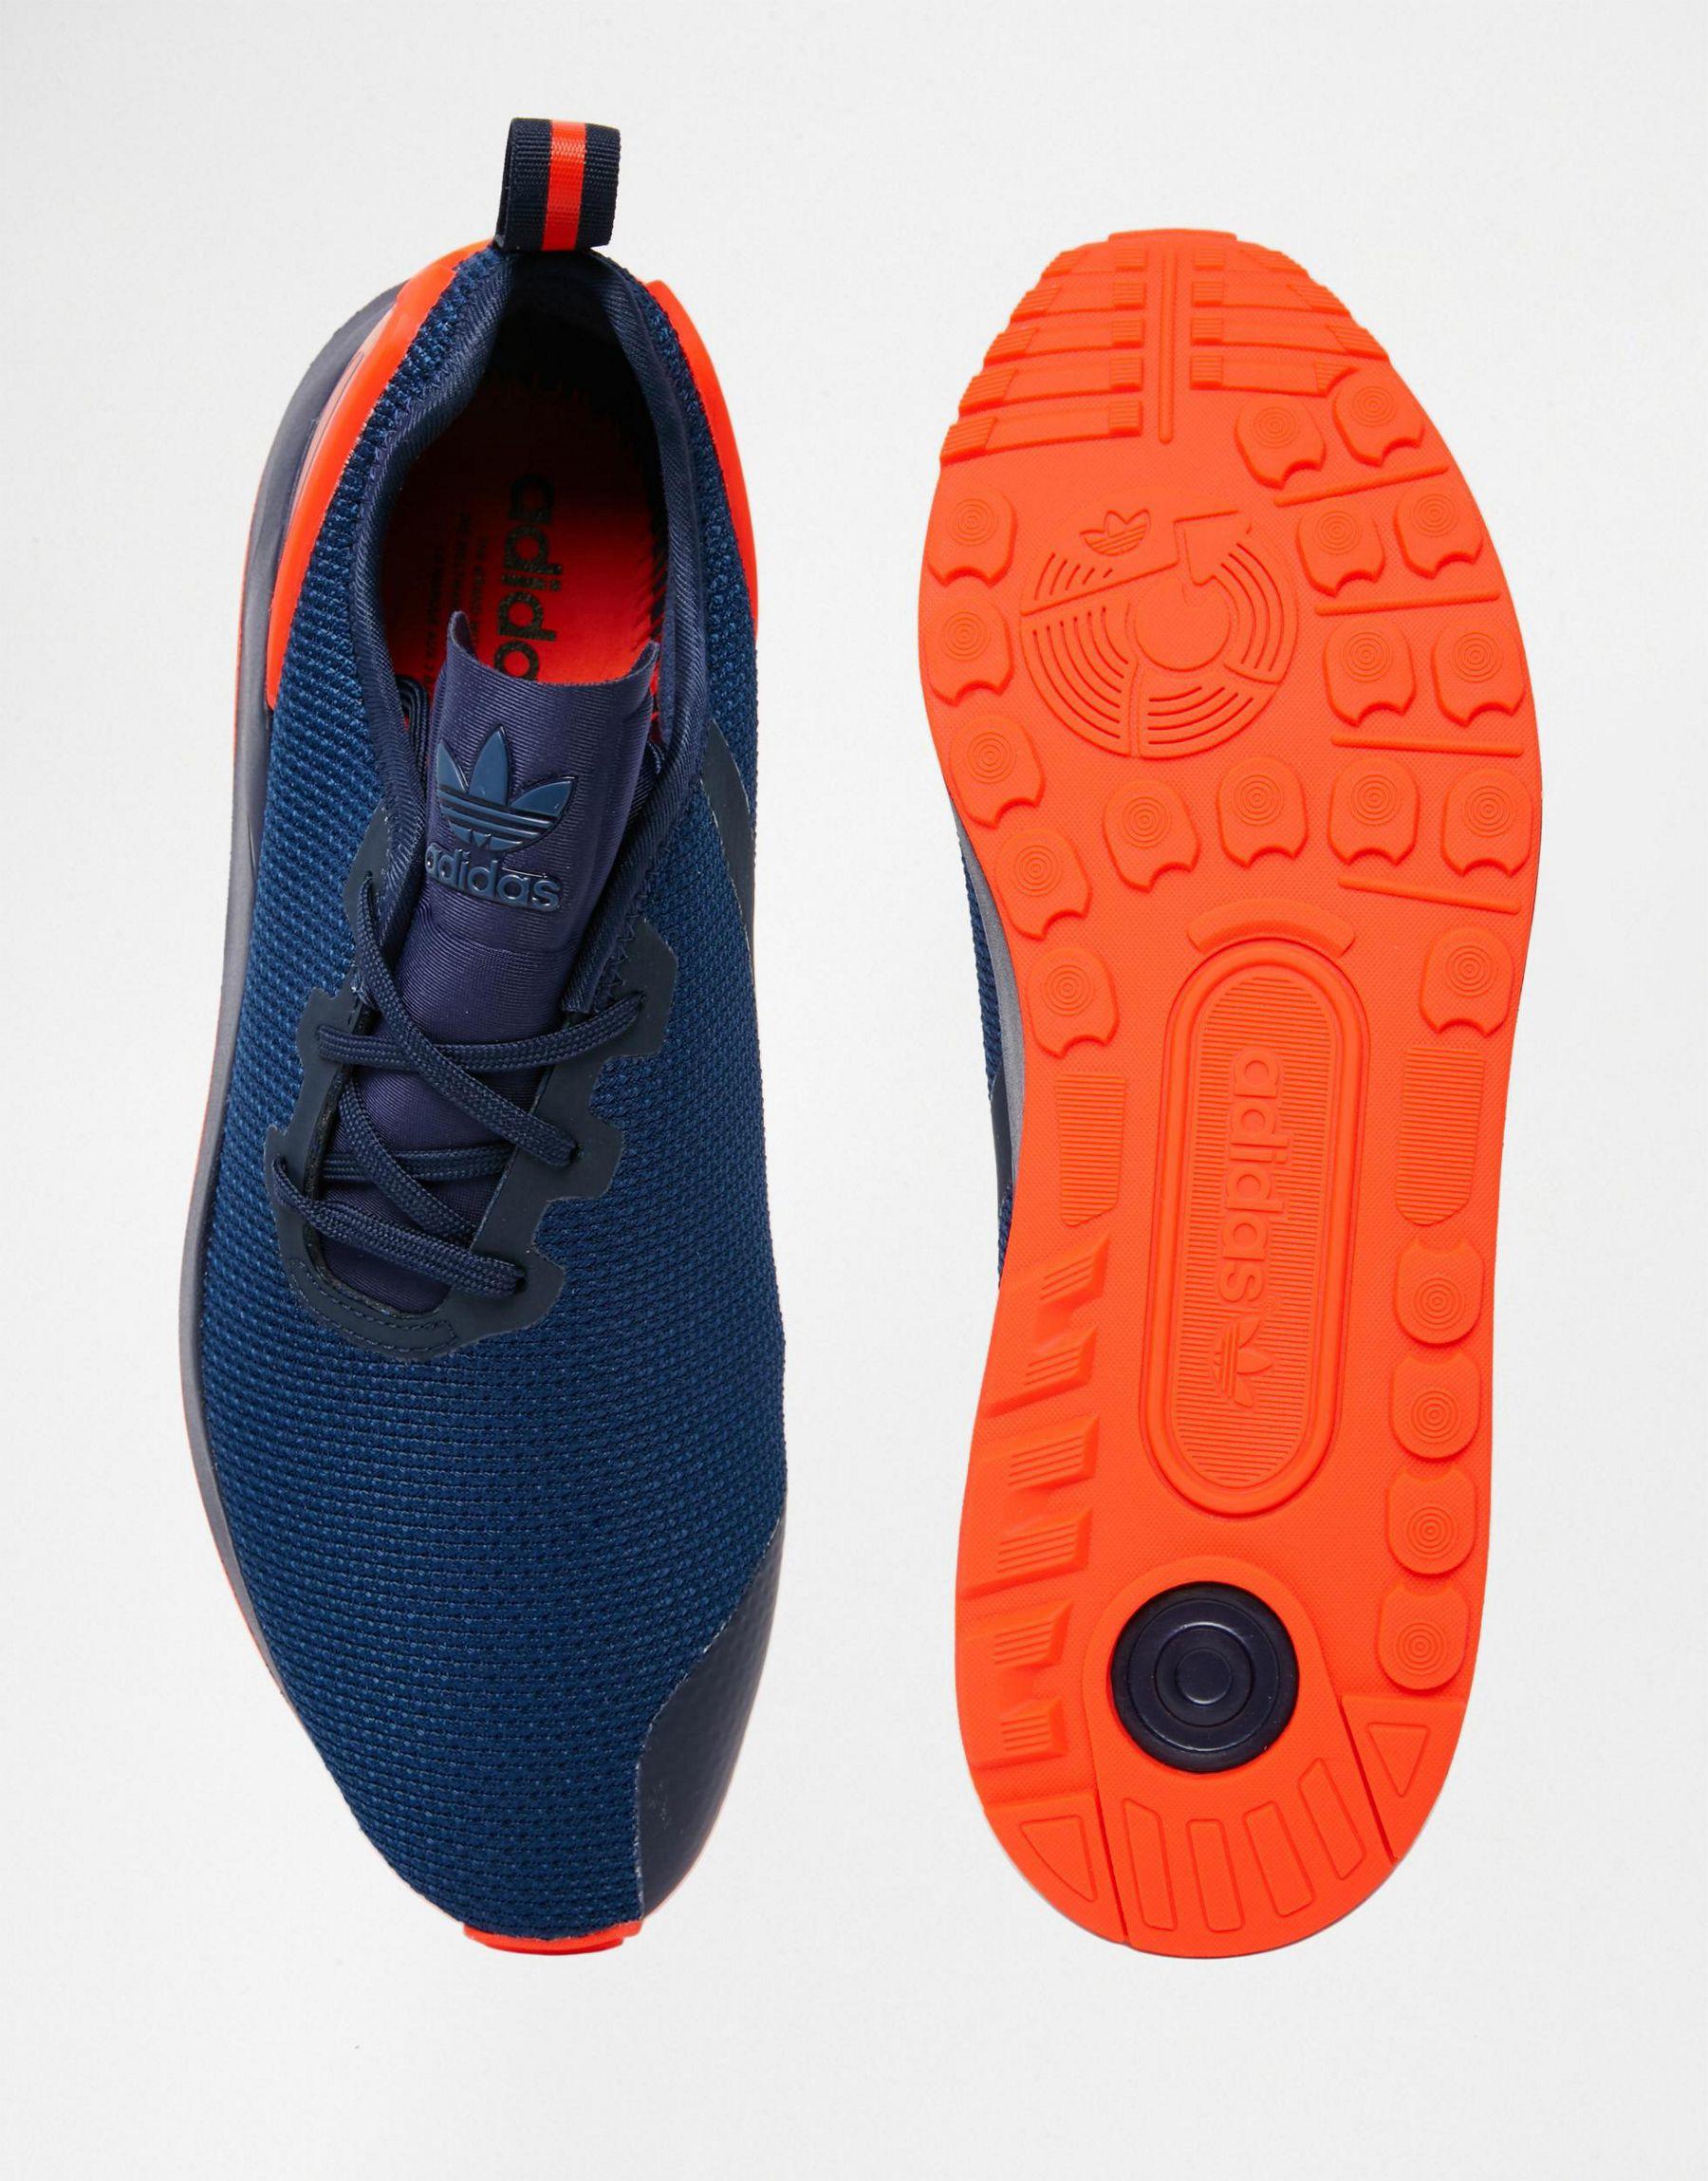 Lyst - Adidas Originals Asymmetrical Zx Flux Trainers Aq3167 in Blue for Men